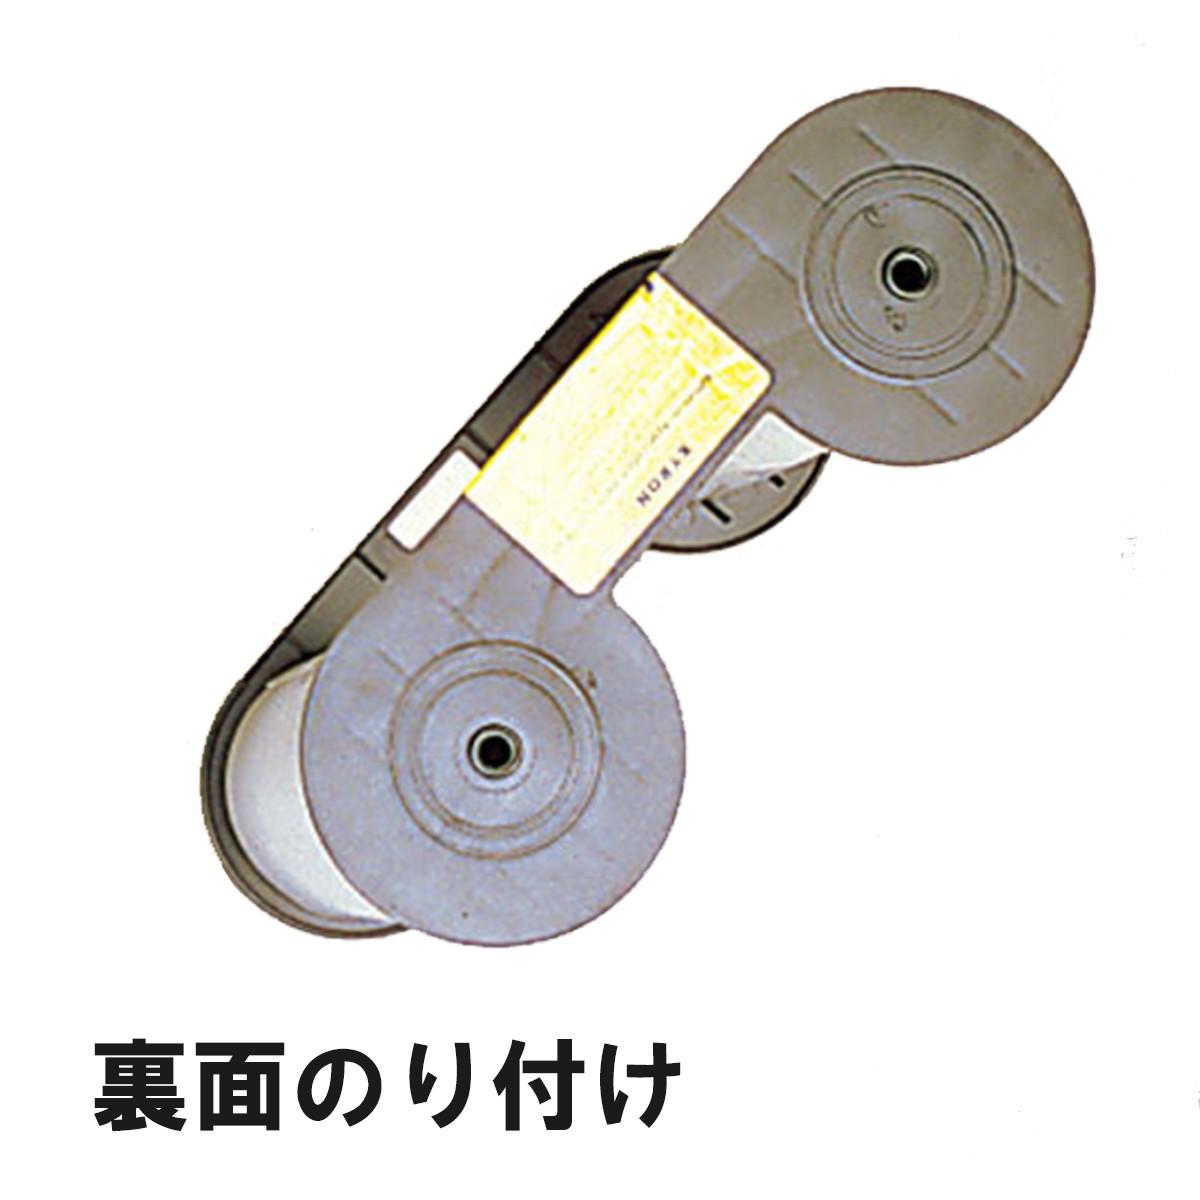 Pro 1255用カートリッジ AT1256-100 裏面のり付け 【 のり 糊 機械 カートリッジ 保護 加工 】